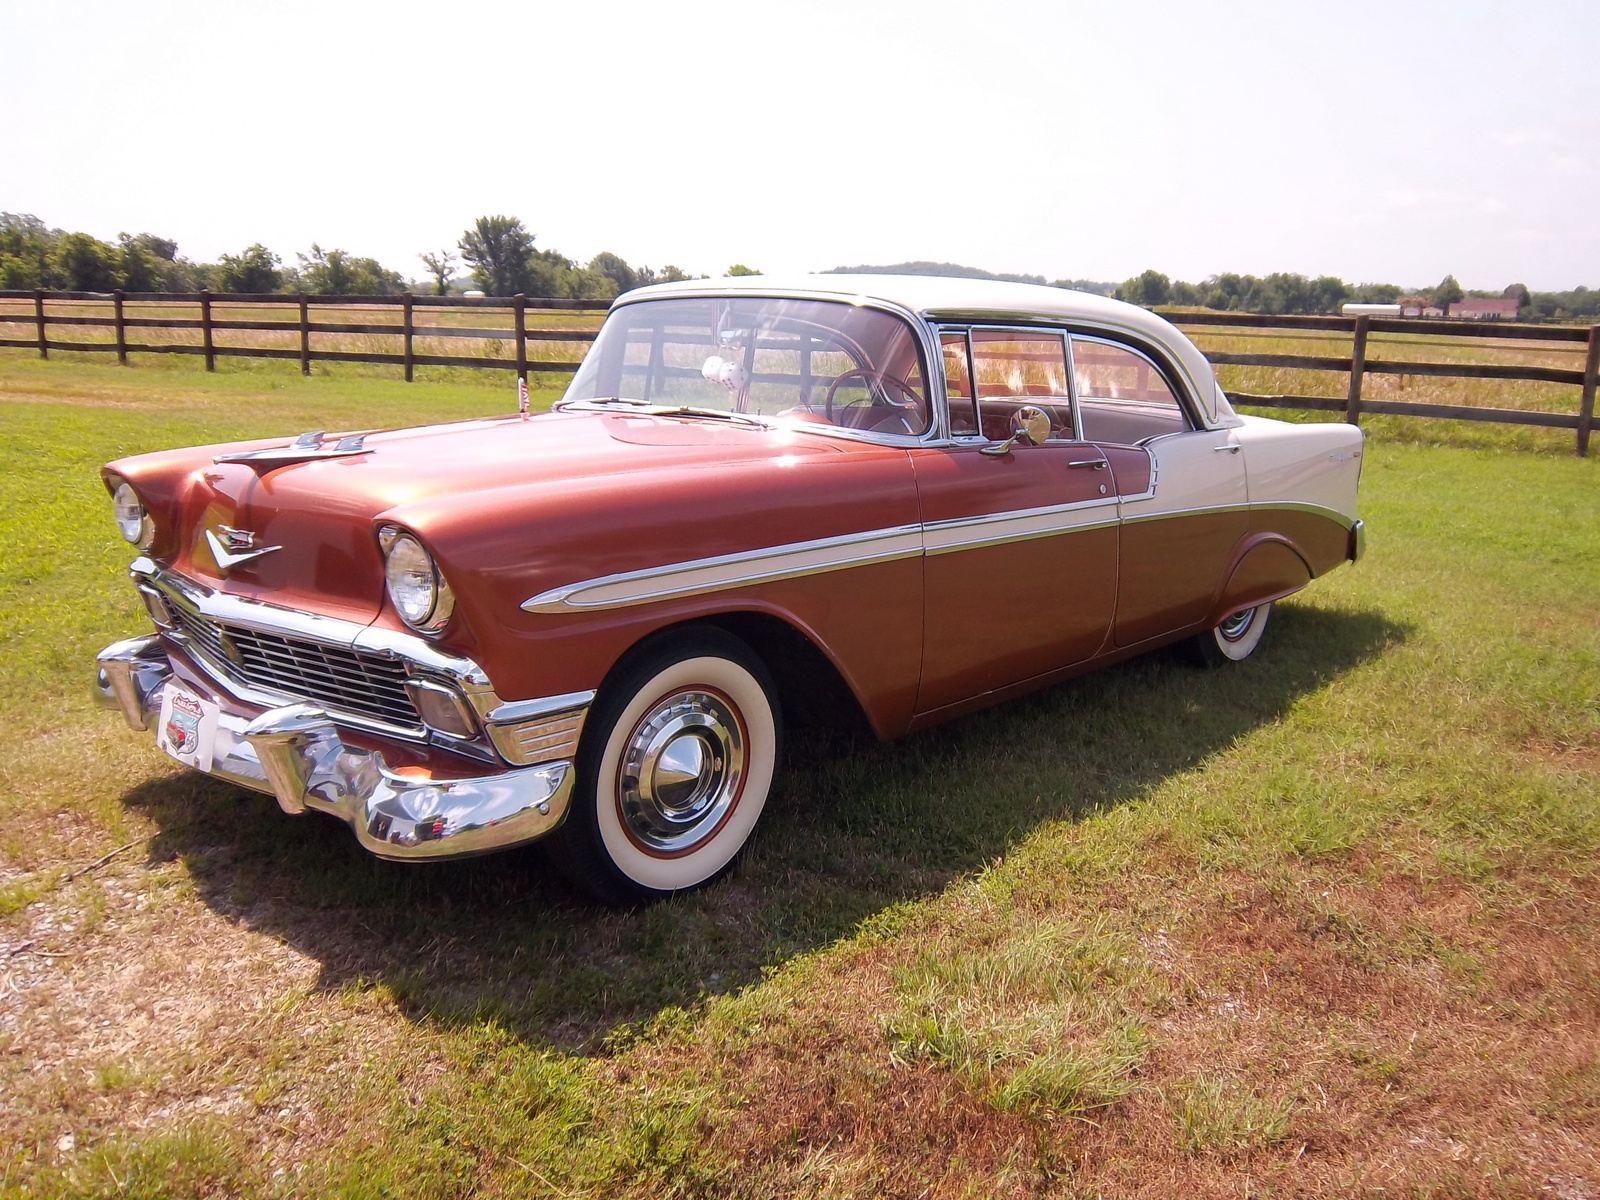 Used Cars Evansville In >> 1956 Chevrolet Bel Air For Sale - CarGurus